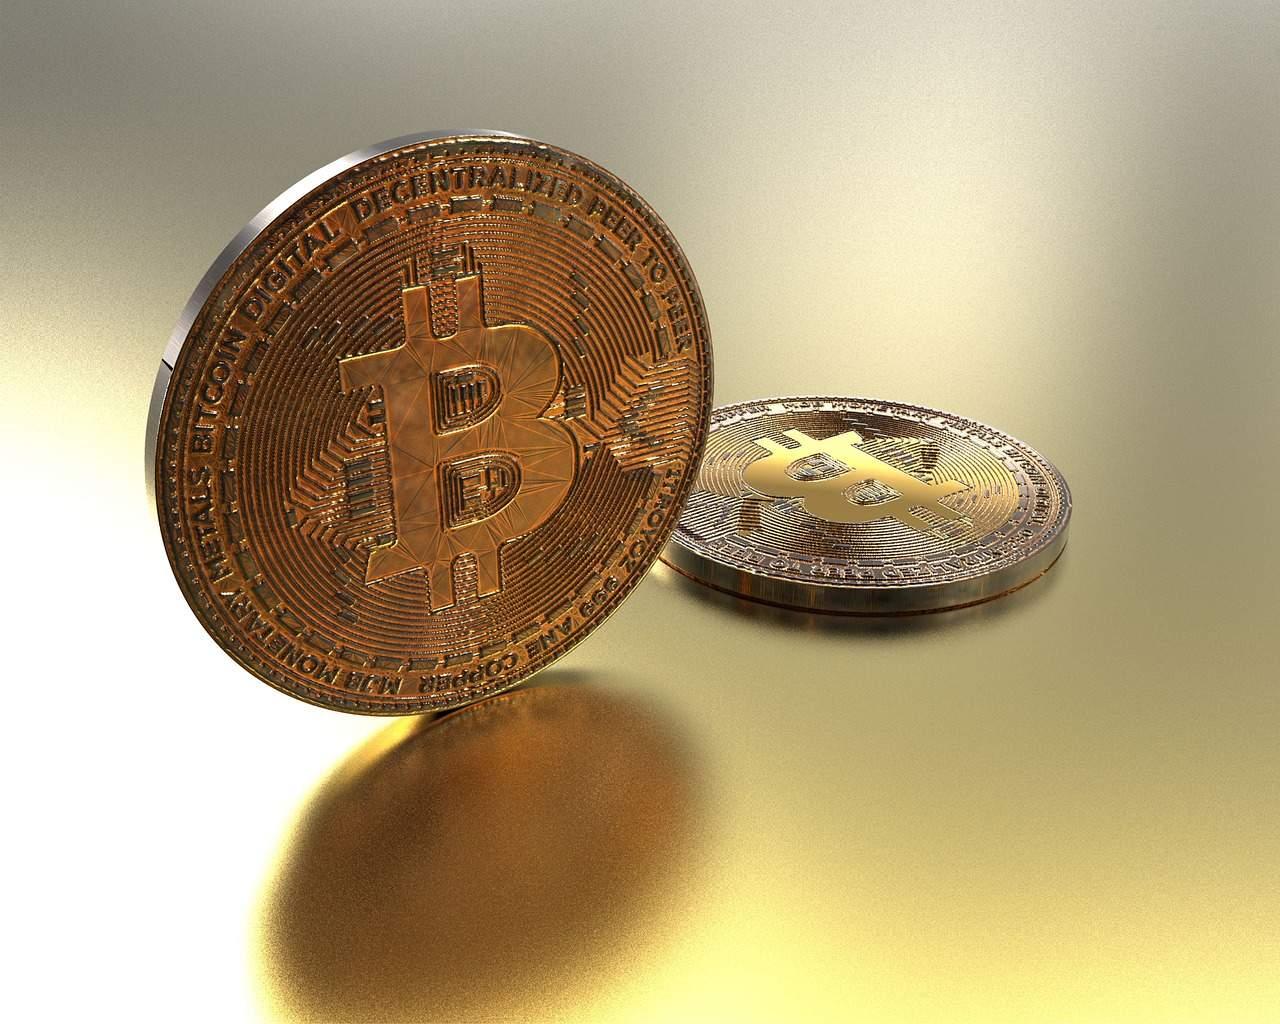 Gefährden Börsenturbulenzen Bitcoins Stabilität?